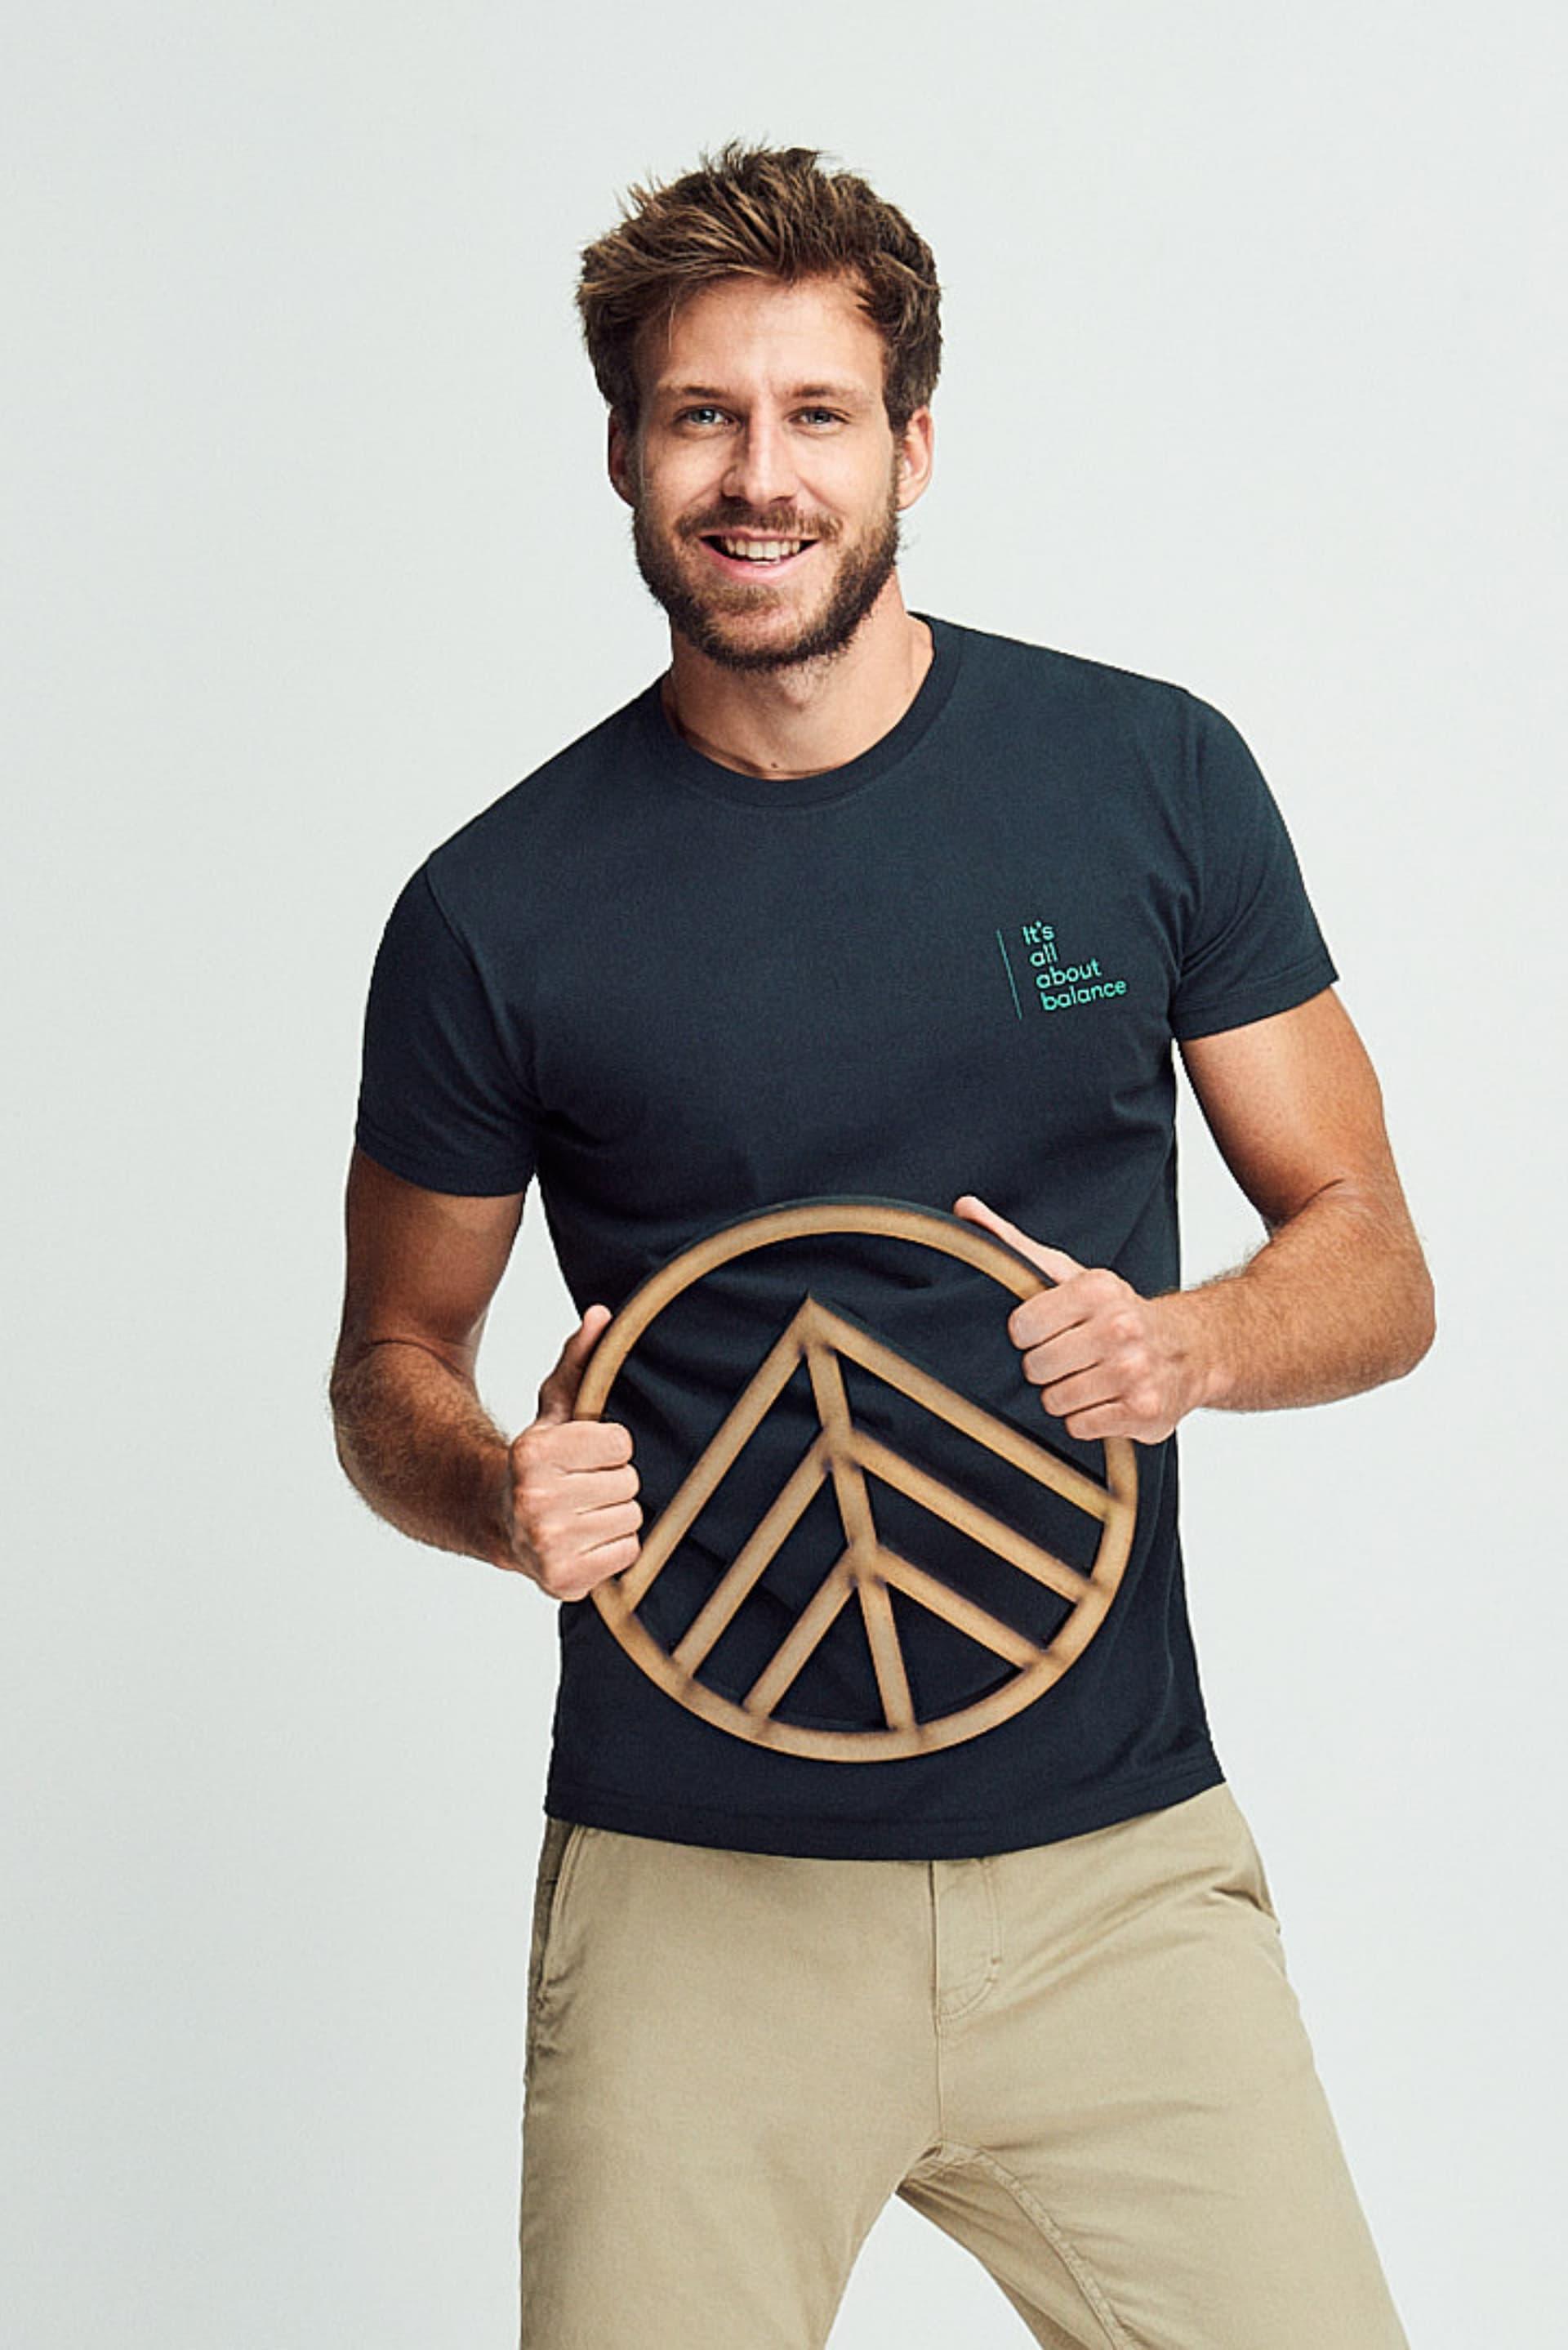 ropa ecológica green forest wear camiseta algodón orgánico certificado